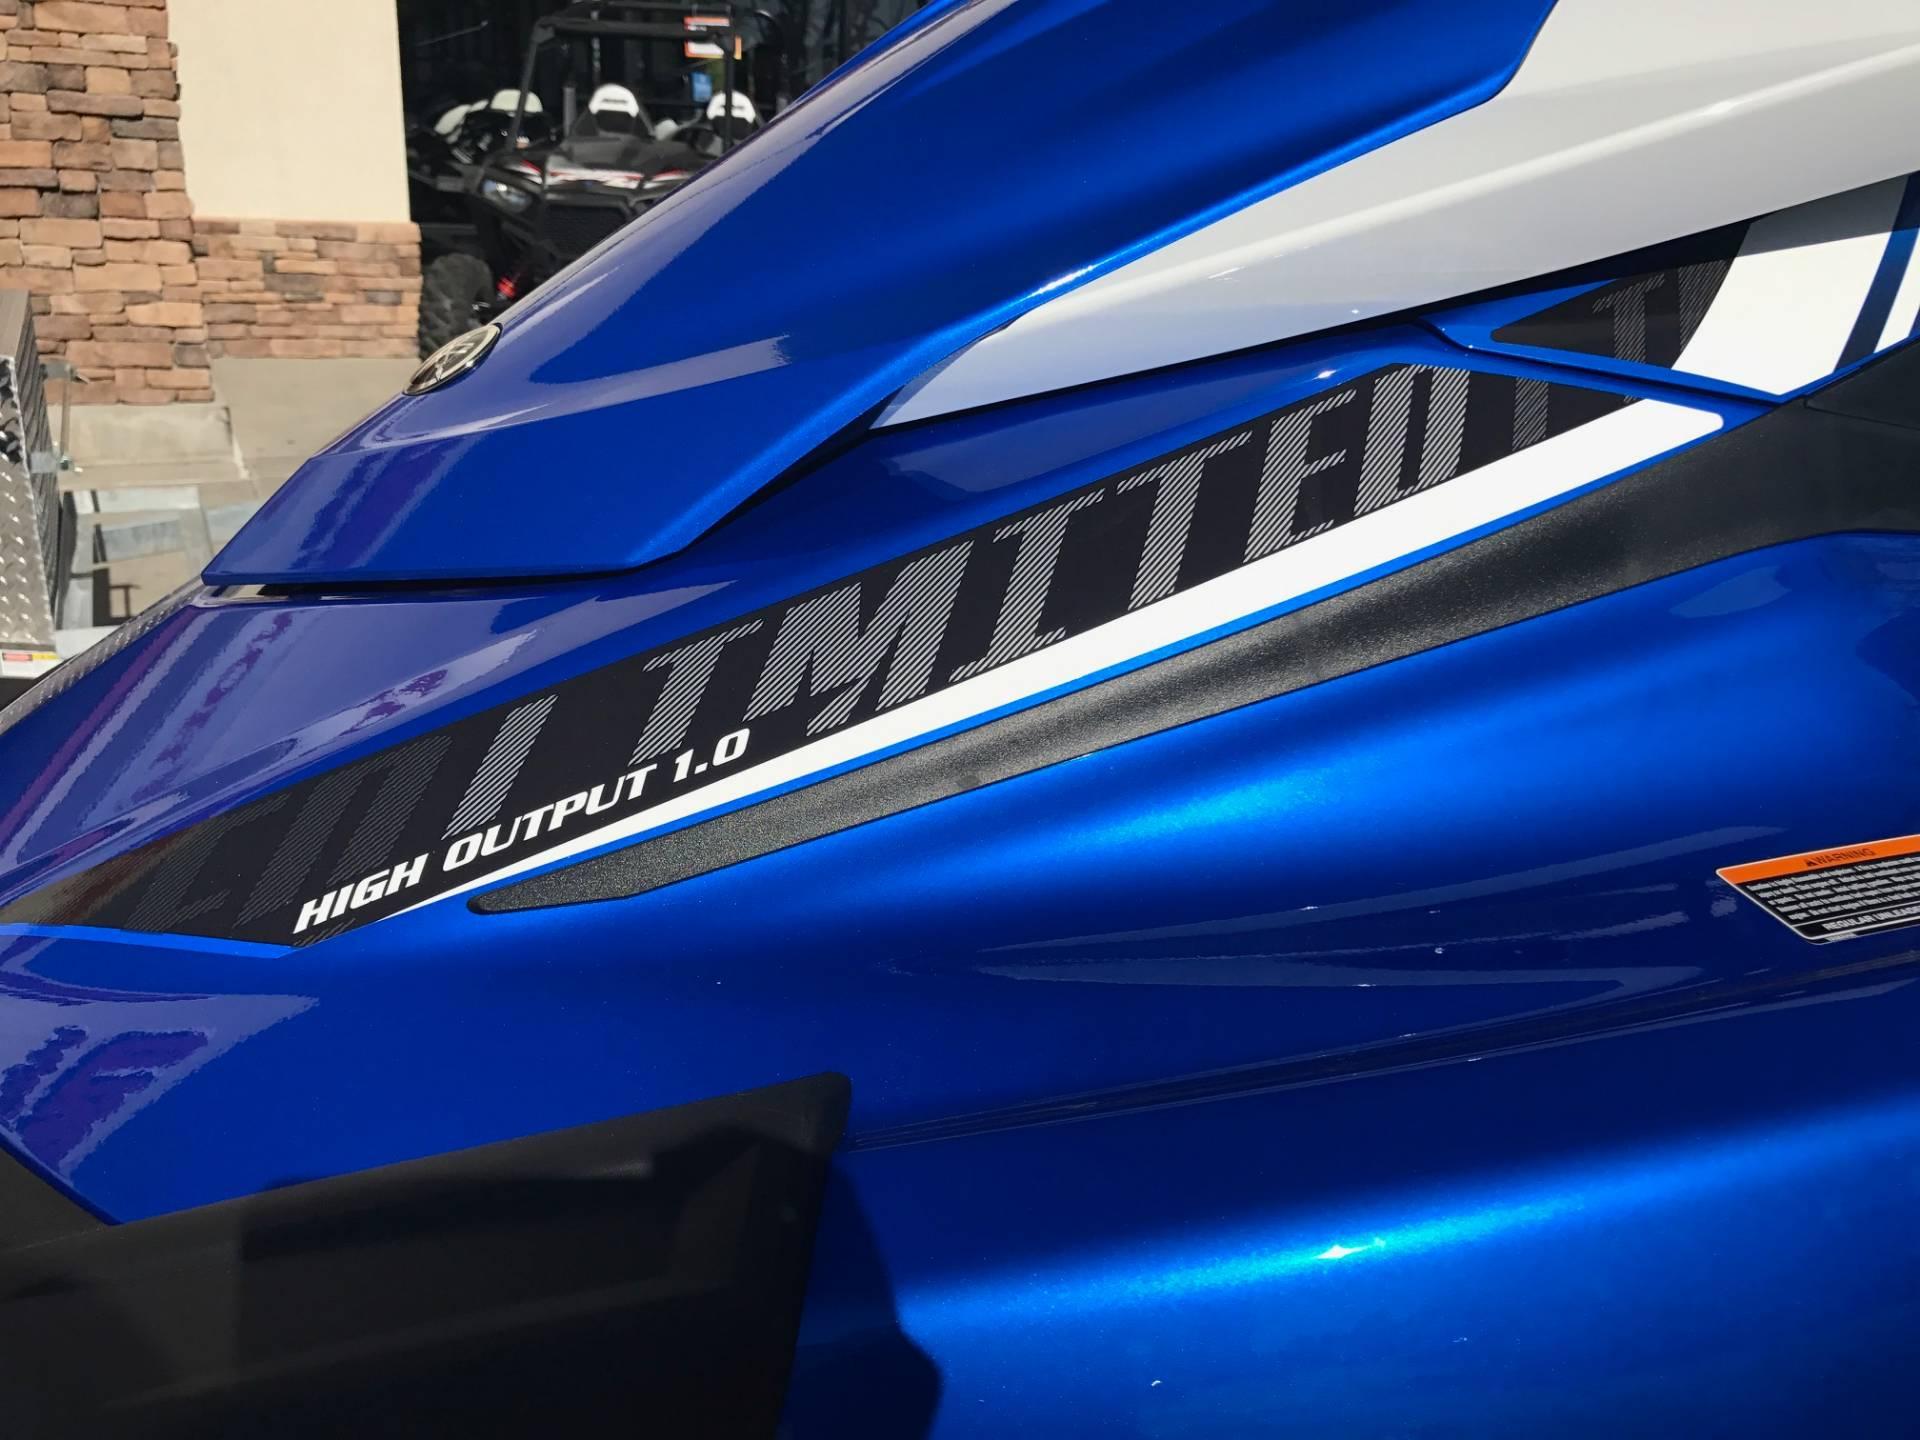 2017 Yamaha VX Limited 6